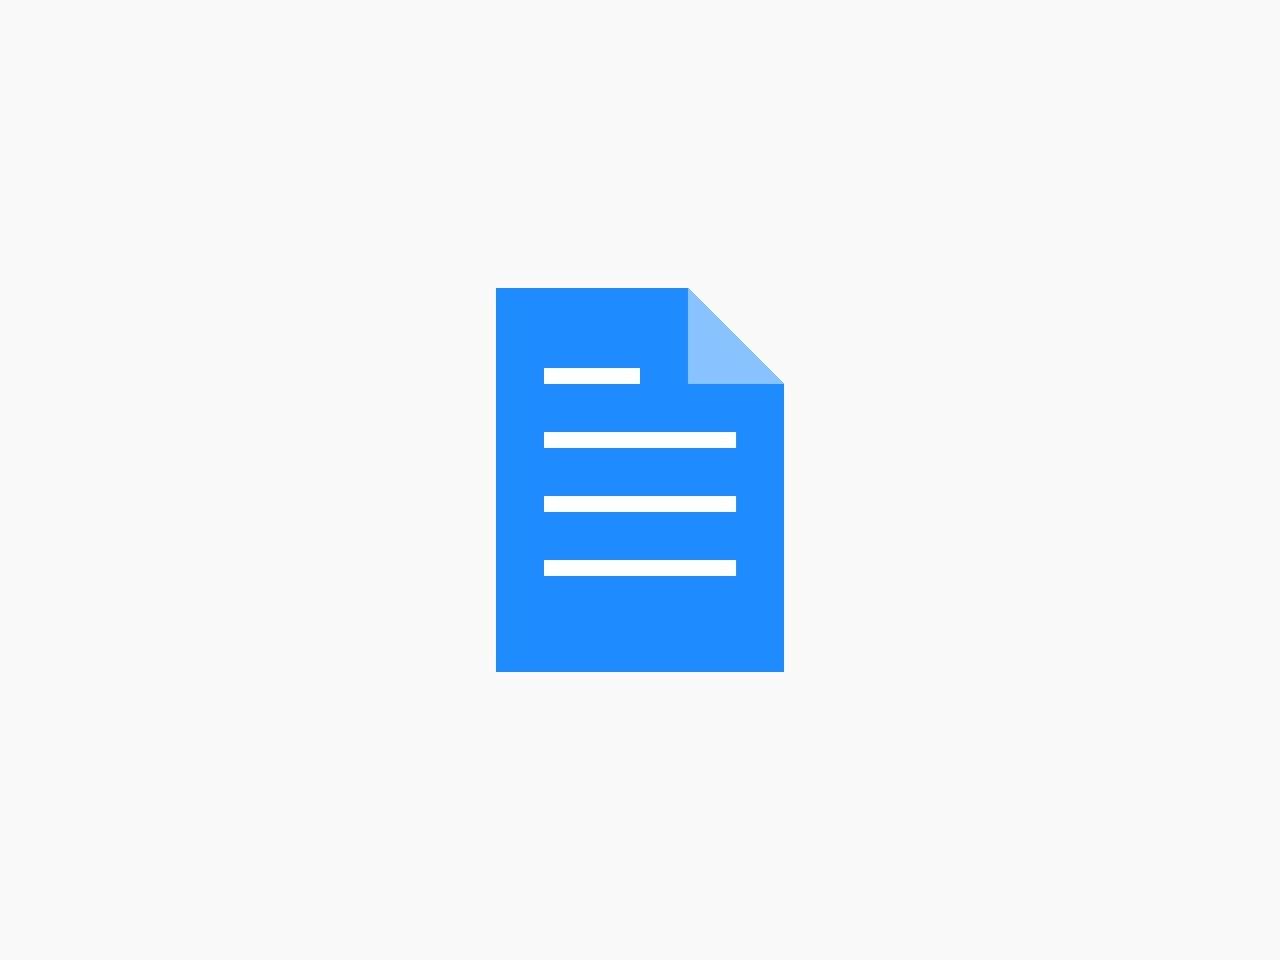 Jasprit Bumrah, Shikhar Dhawan comebacks add spice to Ranji contests